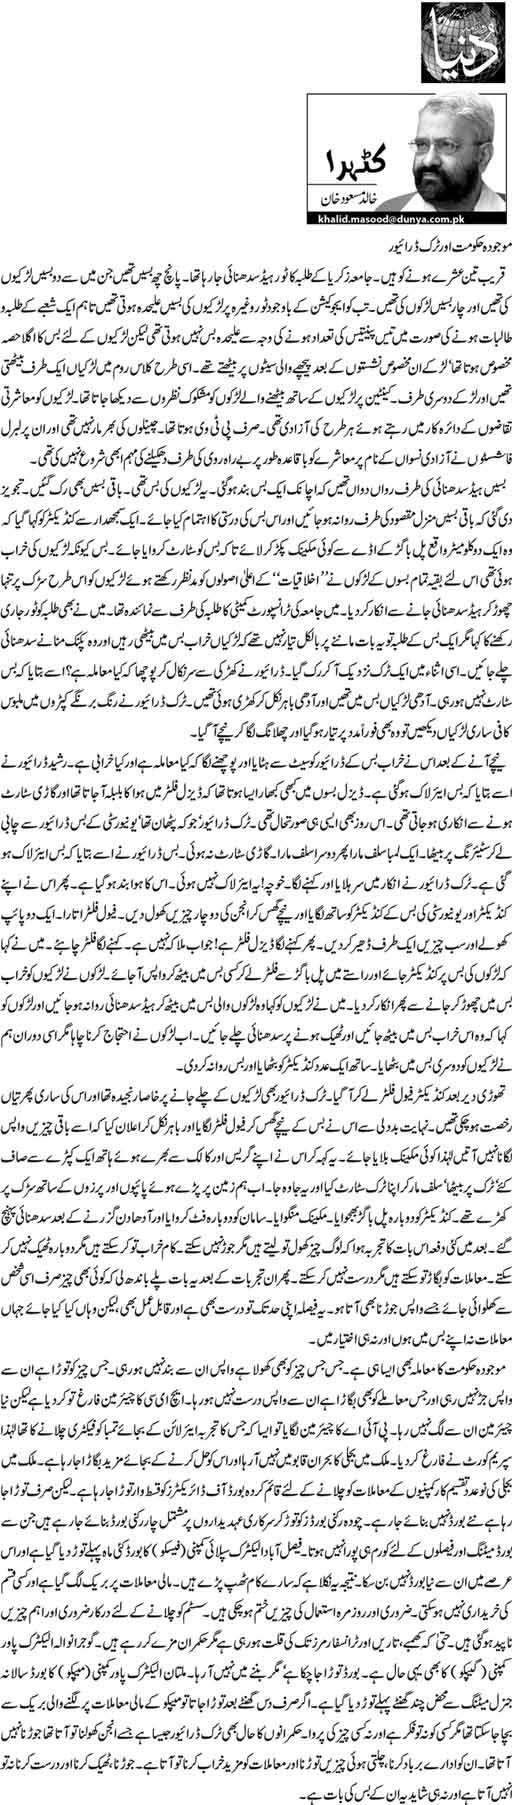 Majooda Hakumat Aur Tarak Driver - Khalid Masood Khan